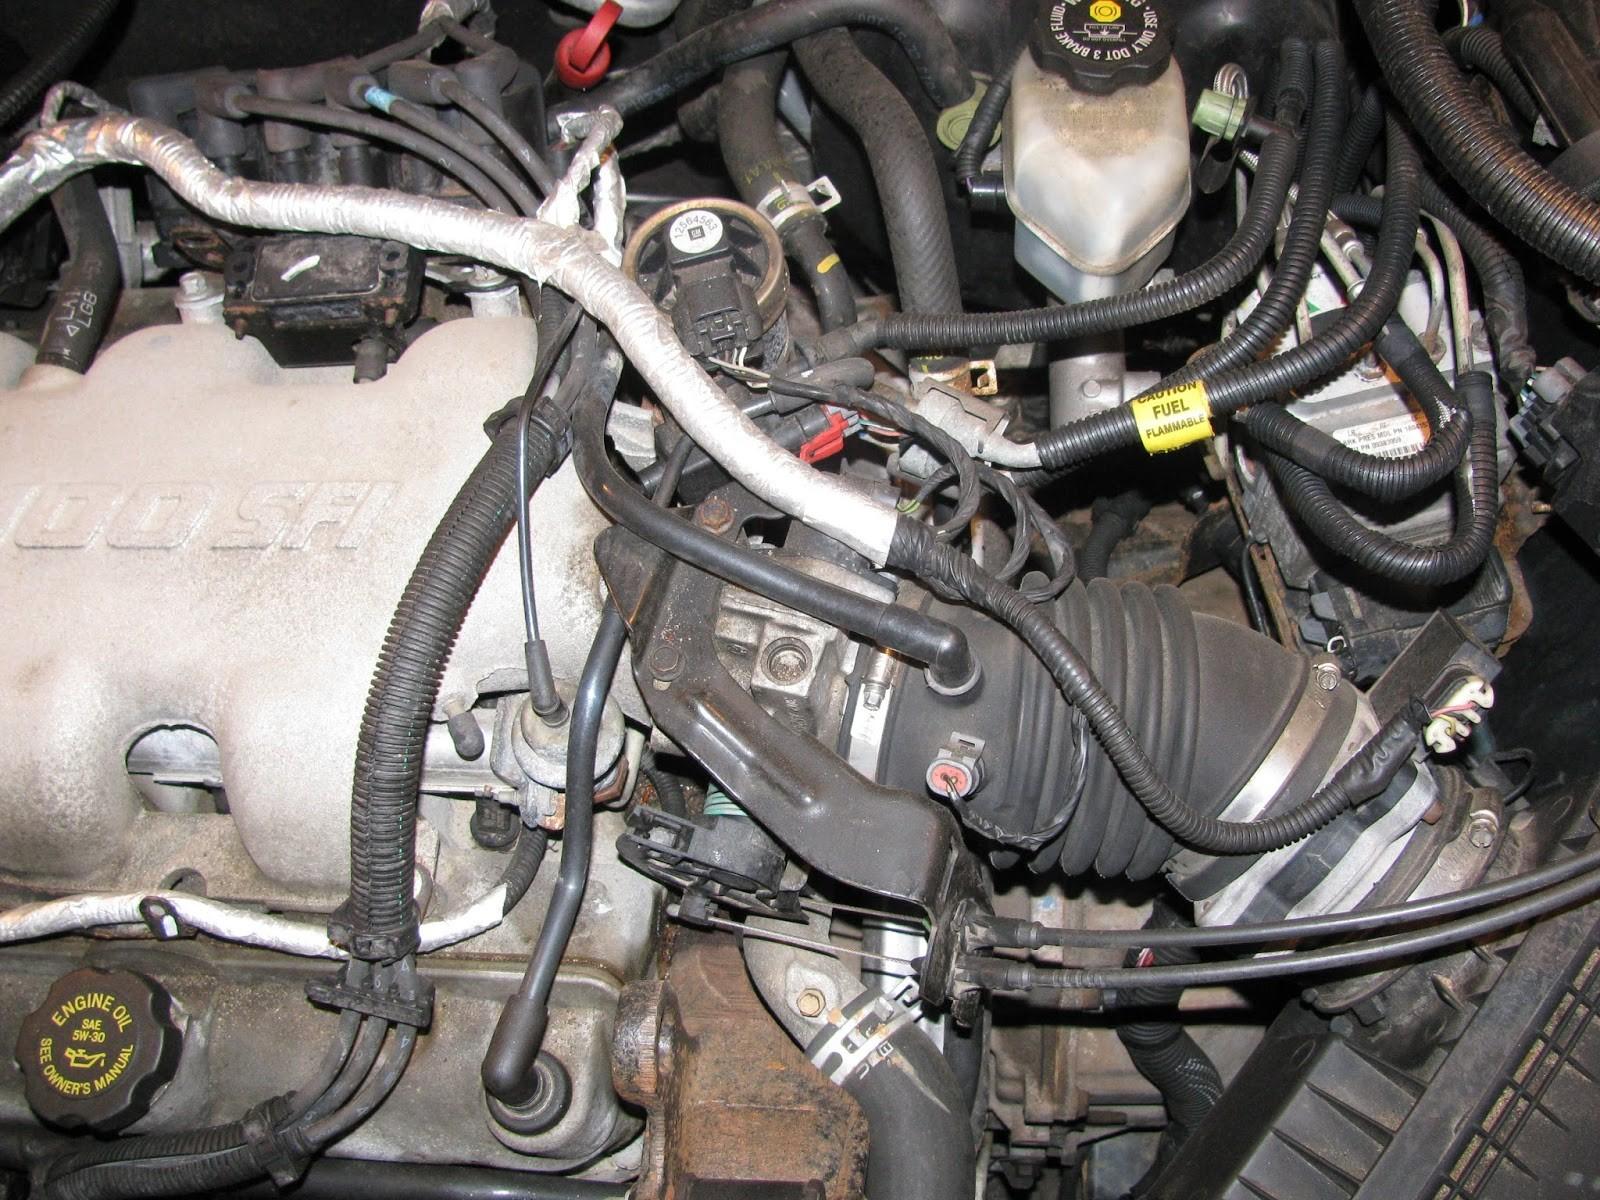 2002 Buick Century Engine Diagram | My Wiring DIagram